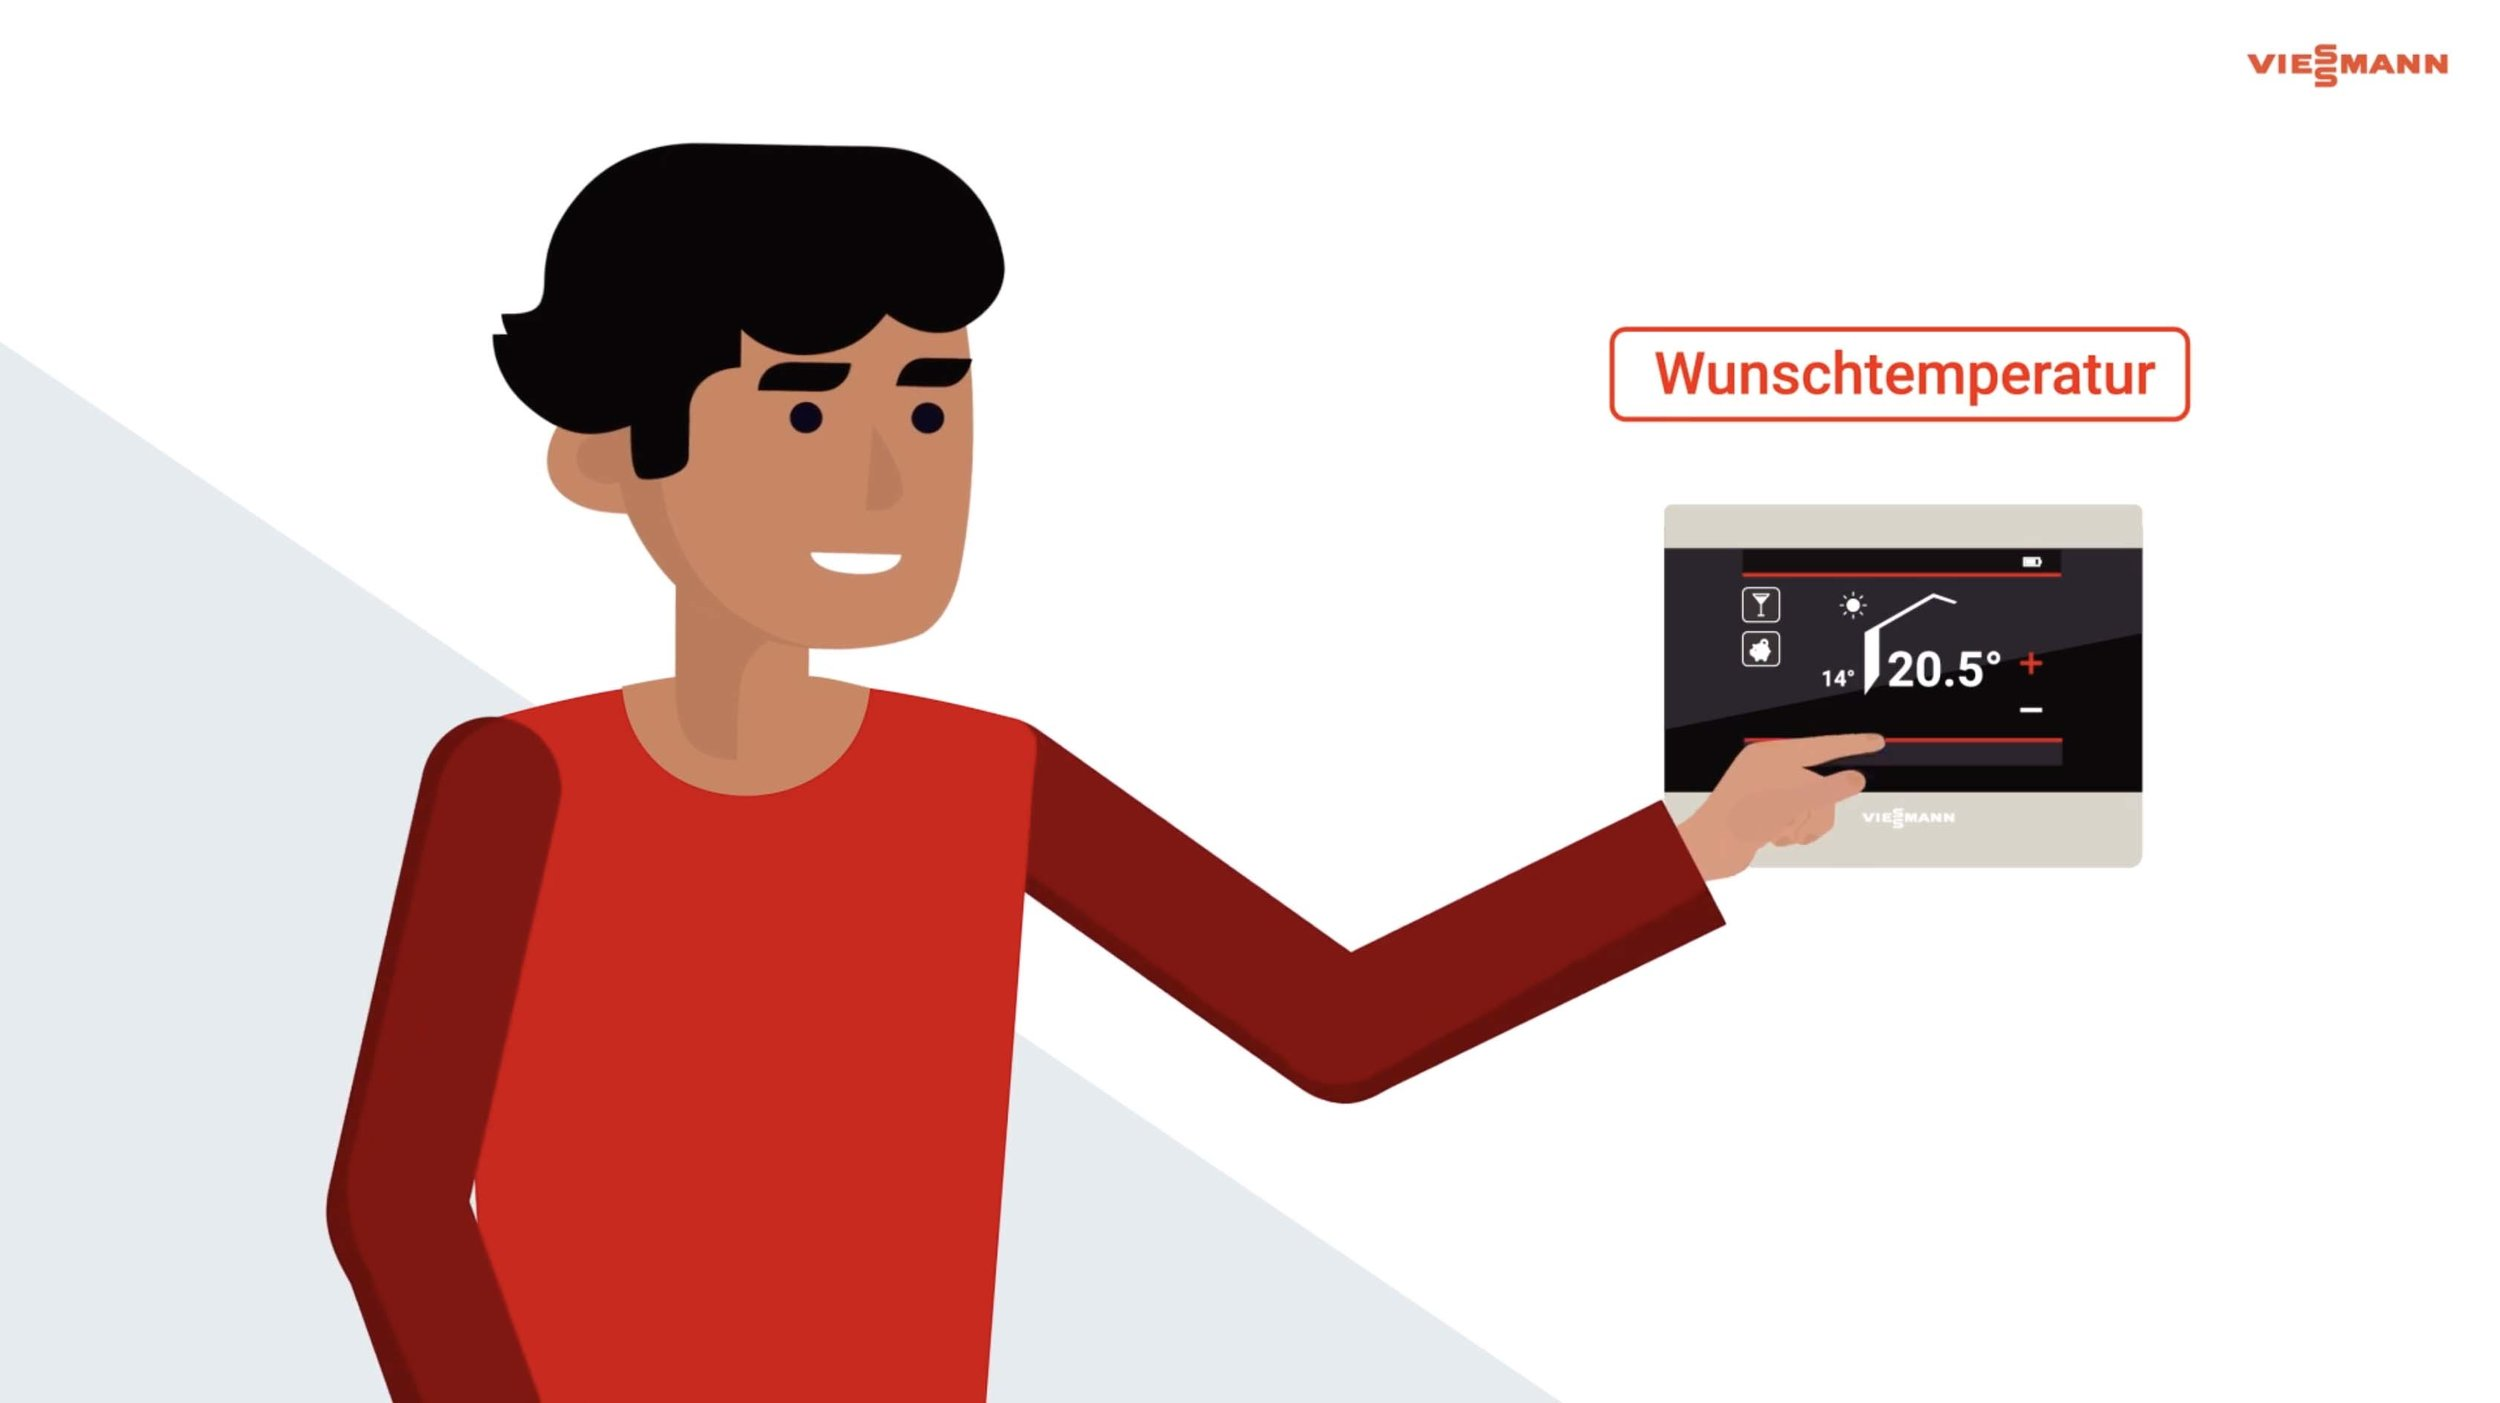 Viessmann - pszabop - 004.jpg